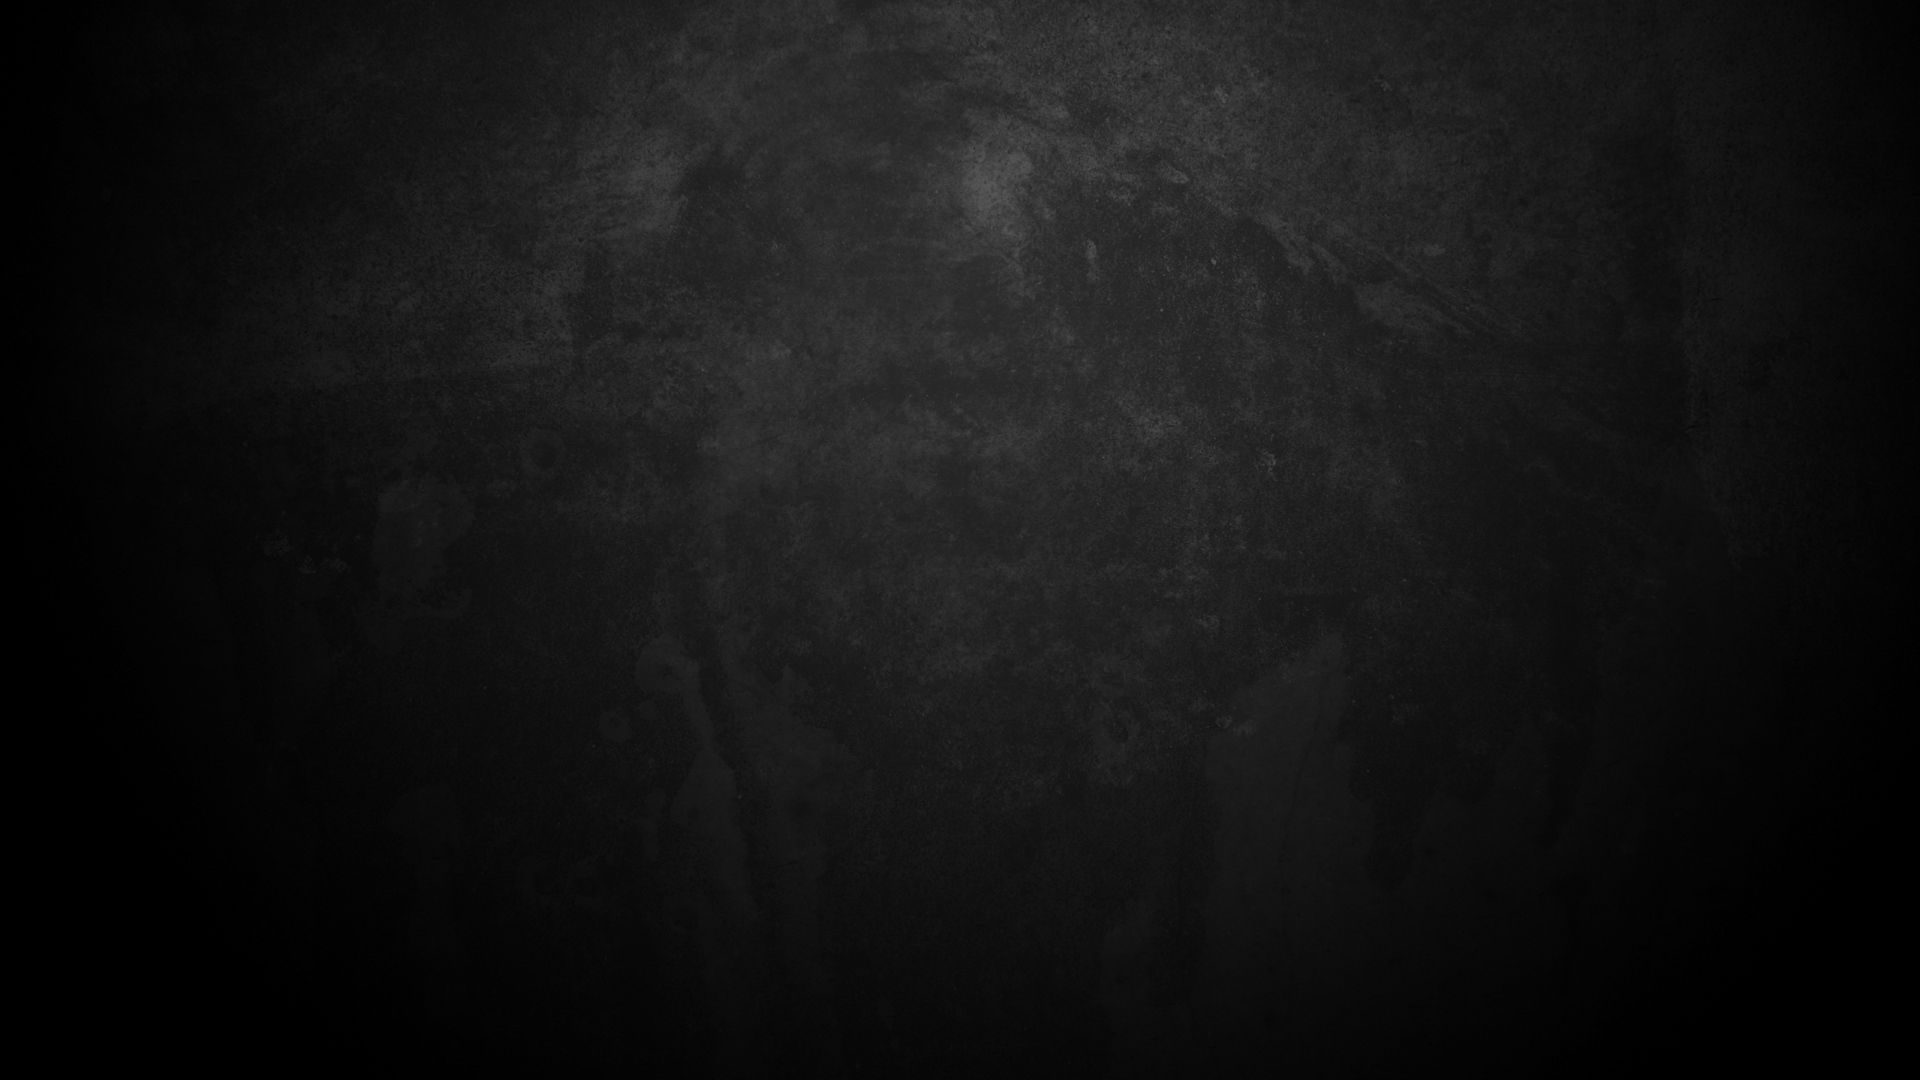 black texture wallpaper 1920x1080 -#main